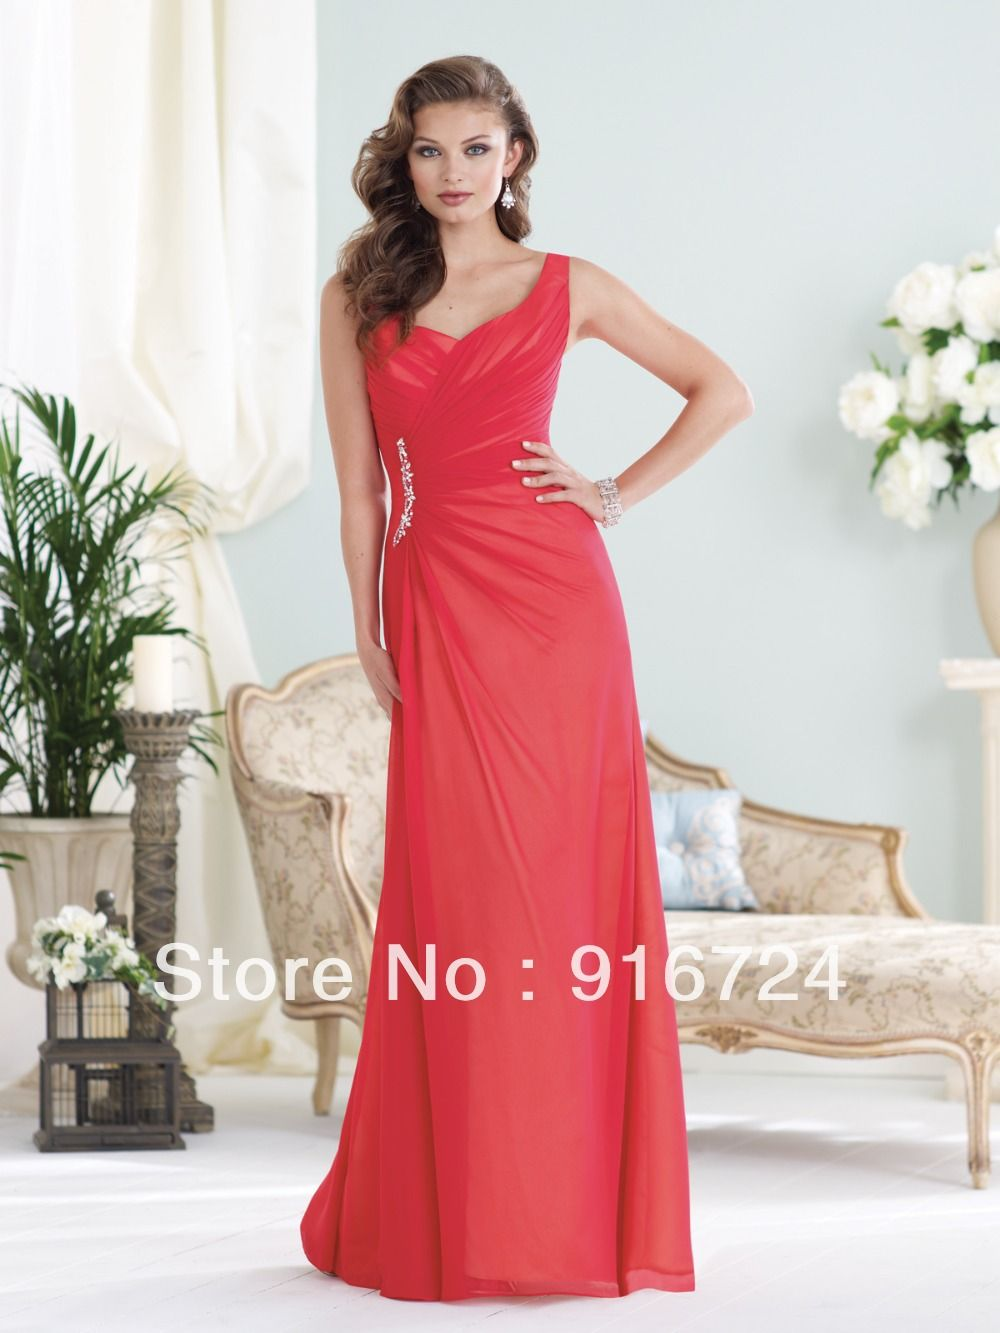 Sleeveless chiffon over satin slim A-line gown asymmetrically draped ...